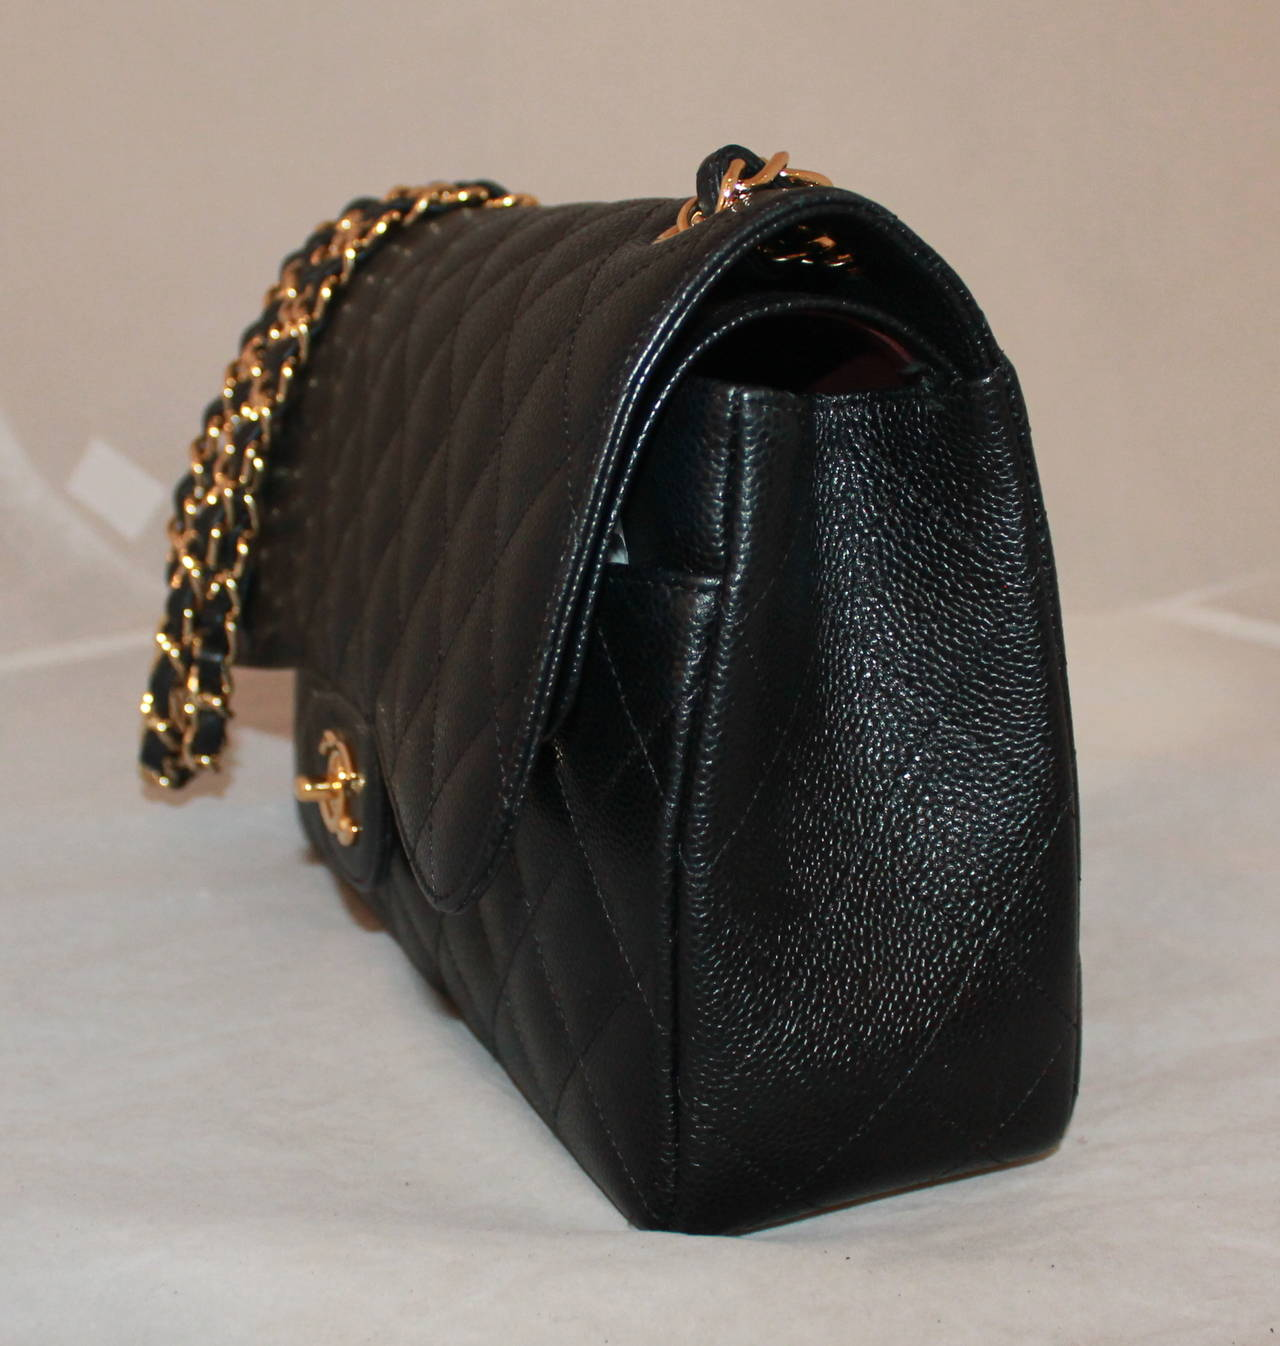 935d5540401 Chanel Black Caviar Jumbo Double Flap Handbag - circa 2014 - NEW WITH BOX  In New